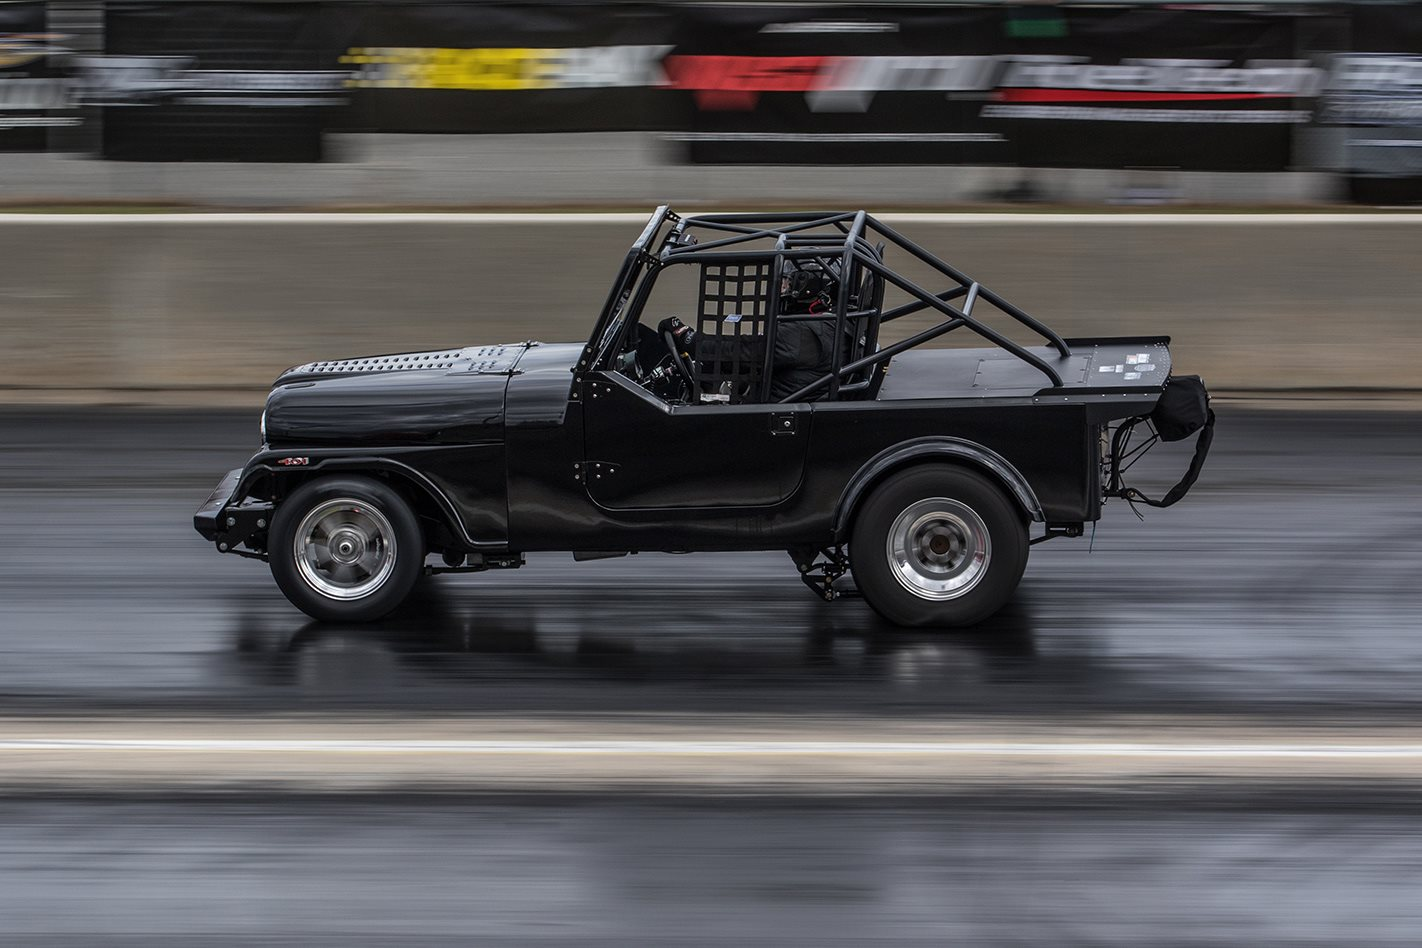 wheelstanding Jeep on radials